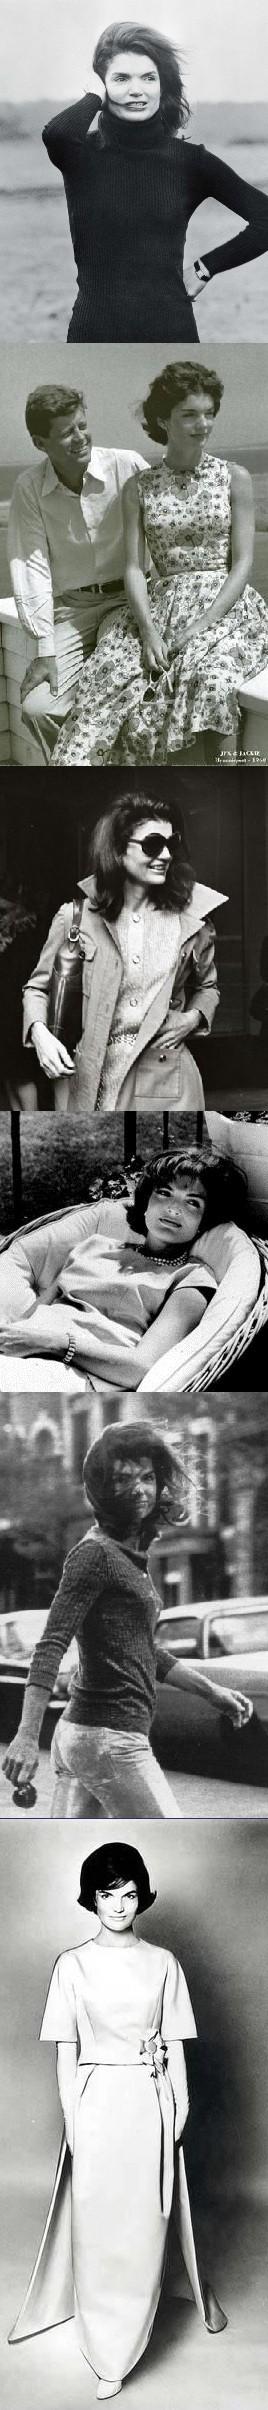 Jackie Kennedy Onassis, style icon.